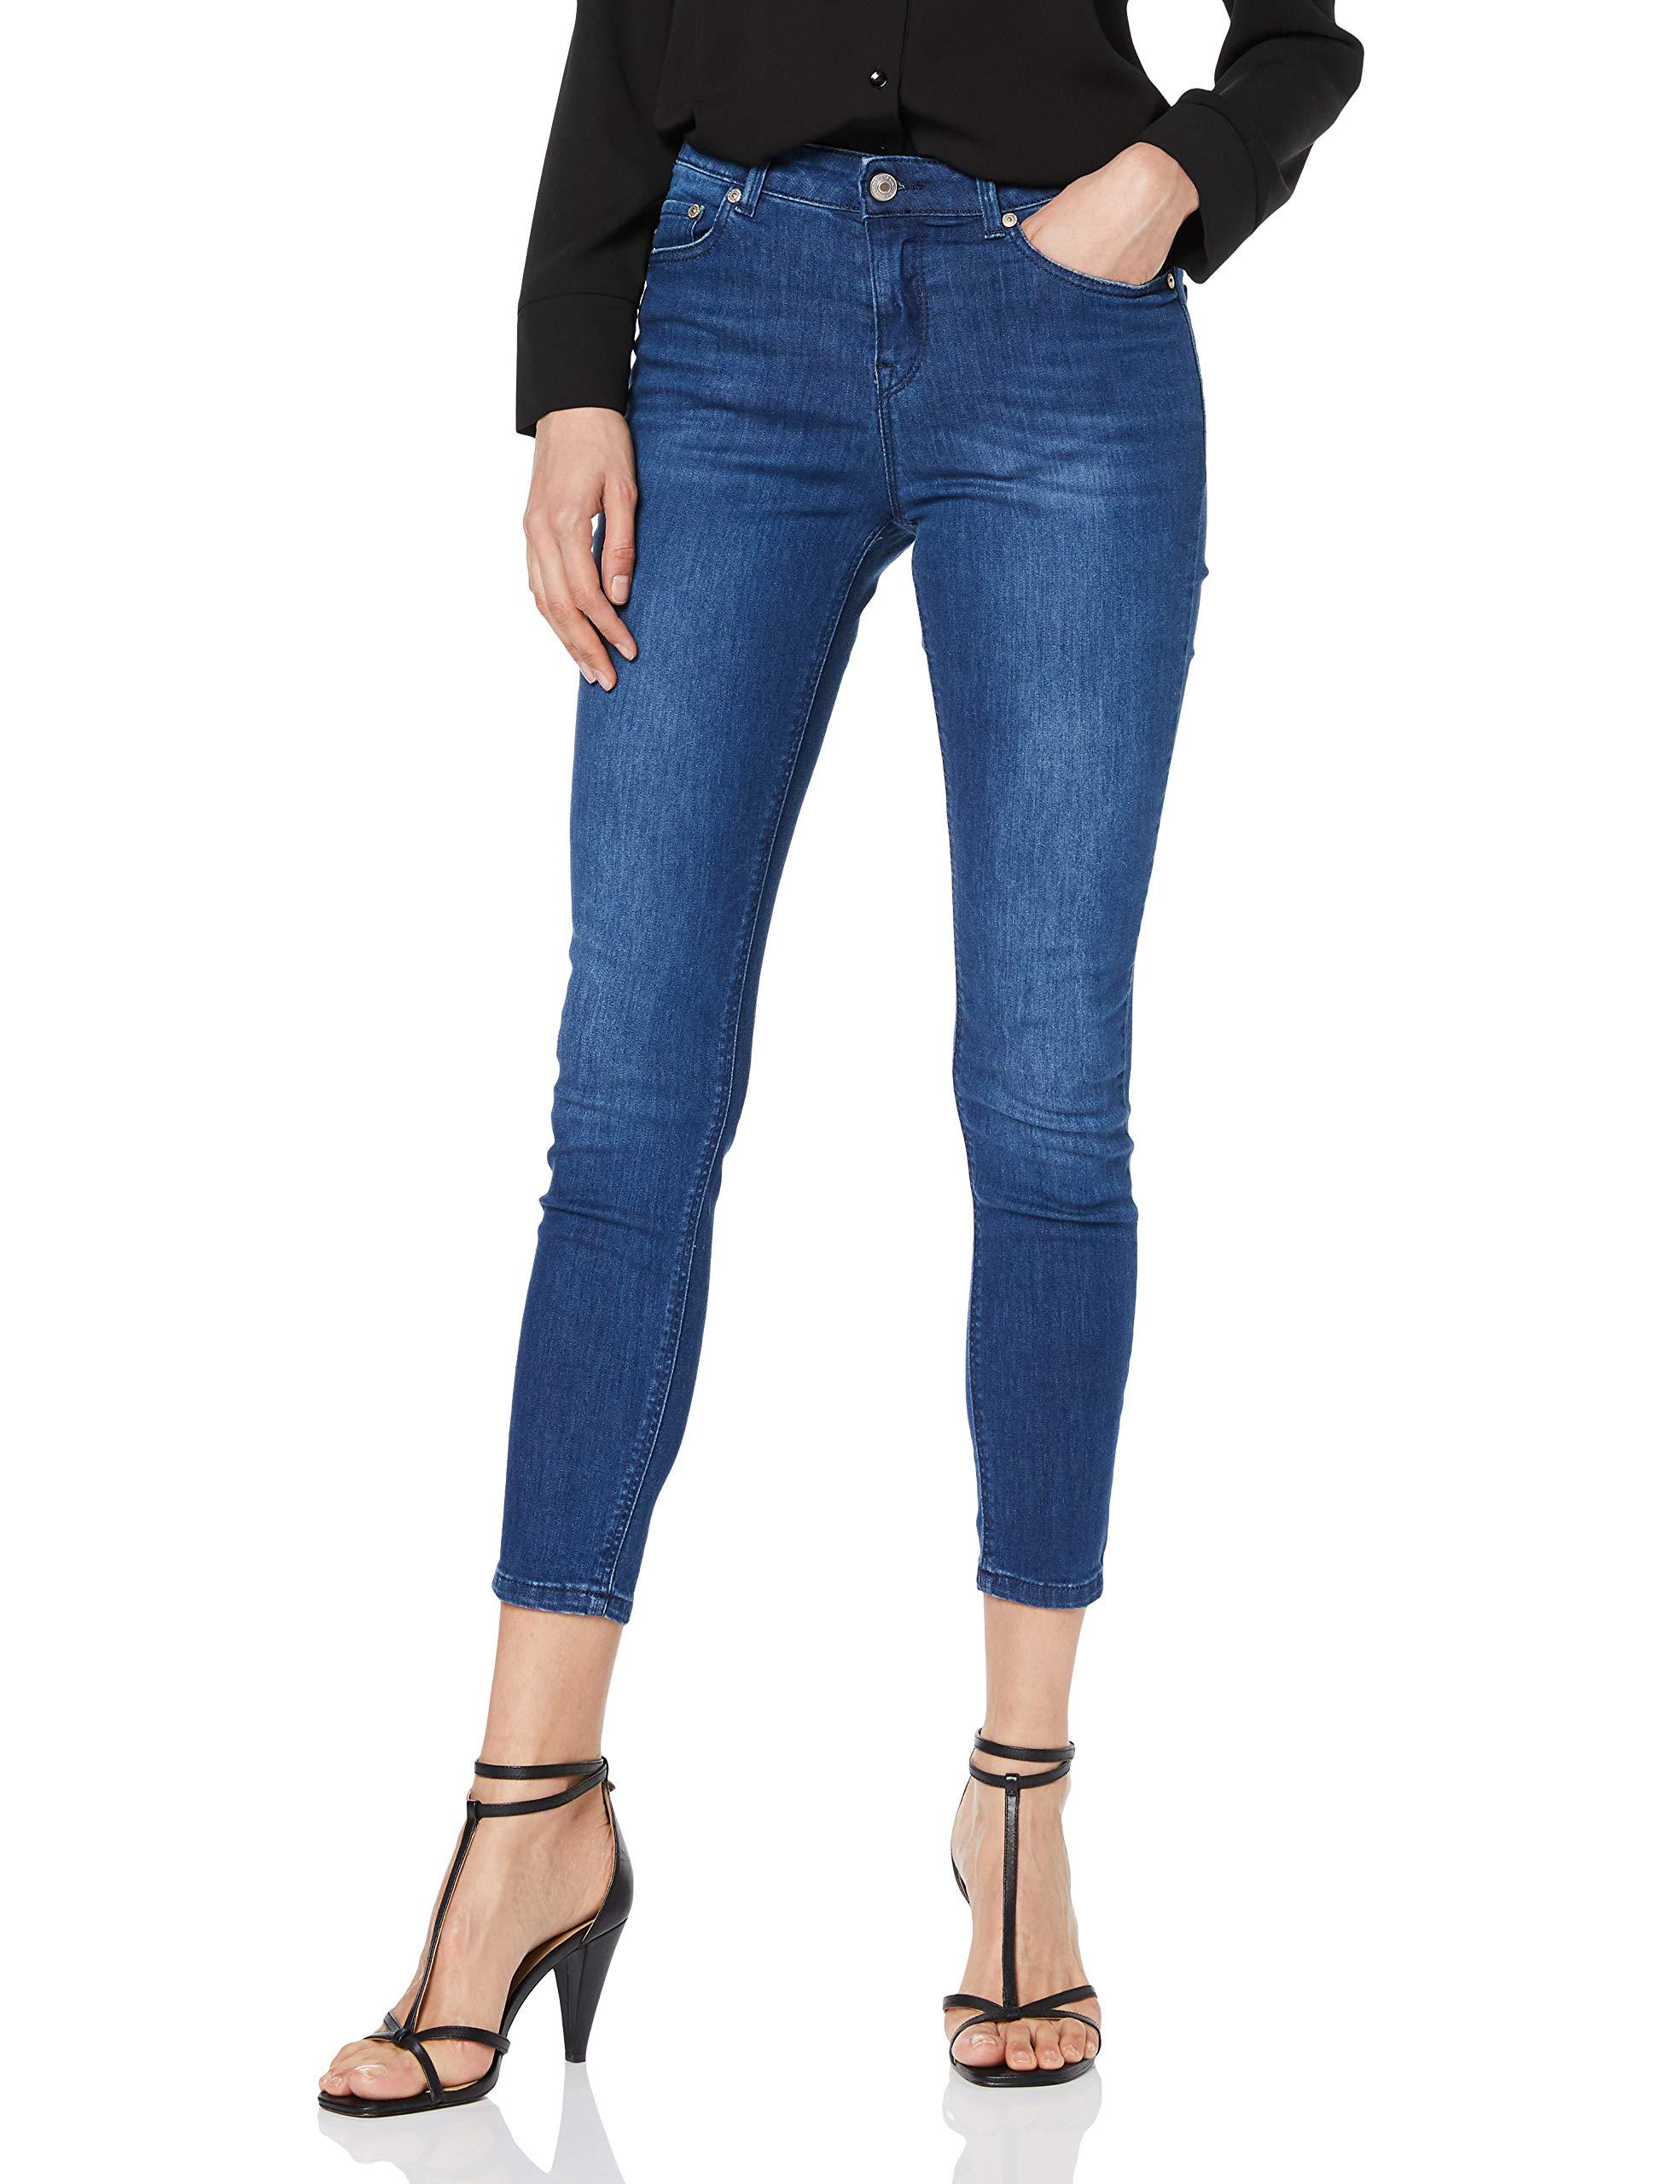 Jean United SkinnyBleublu 70f27 Benetton Colors Trousers Of pMqSGUzV